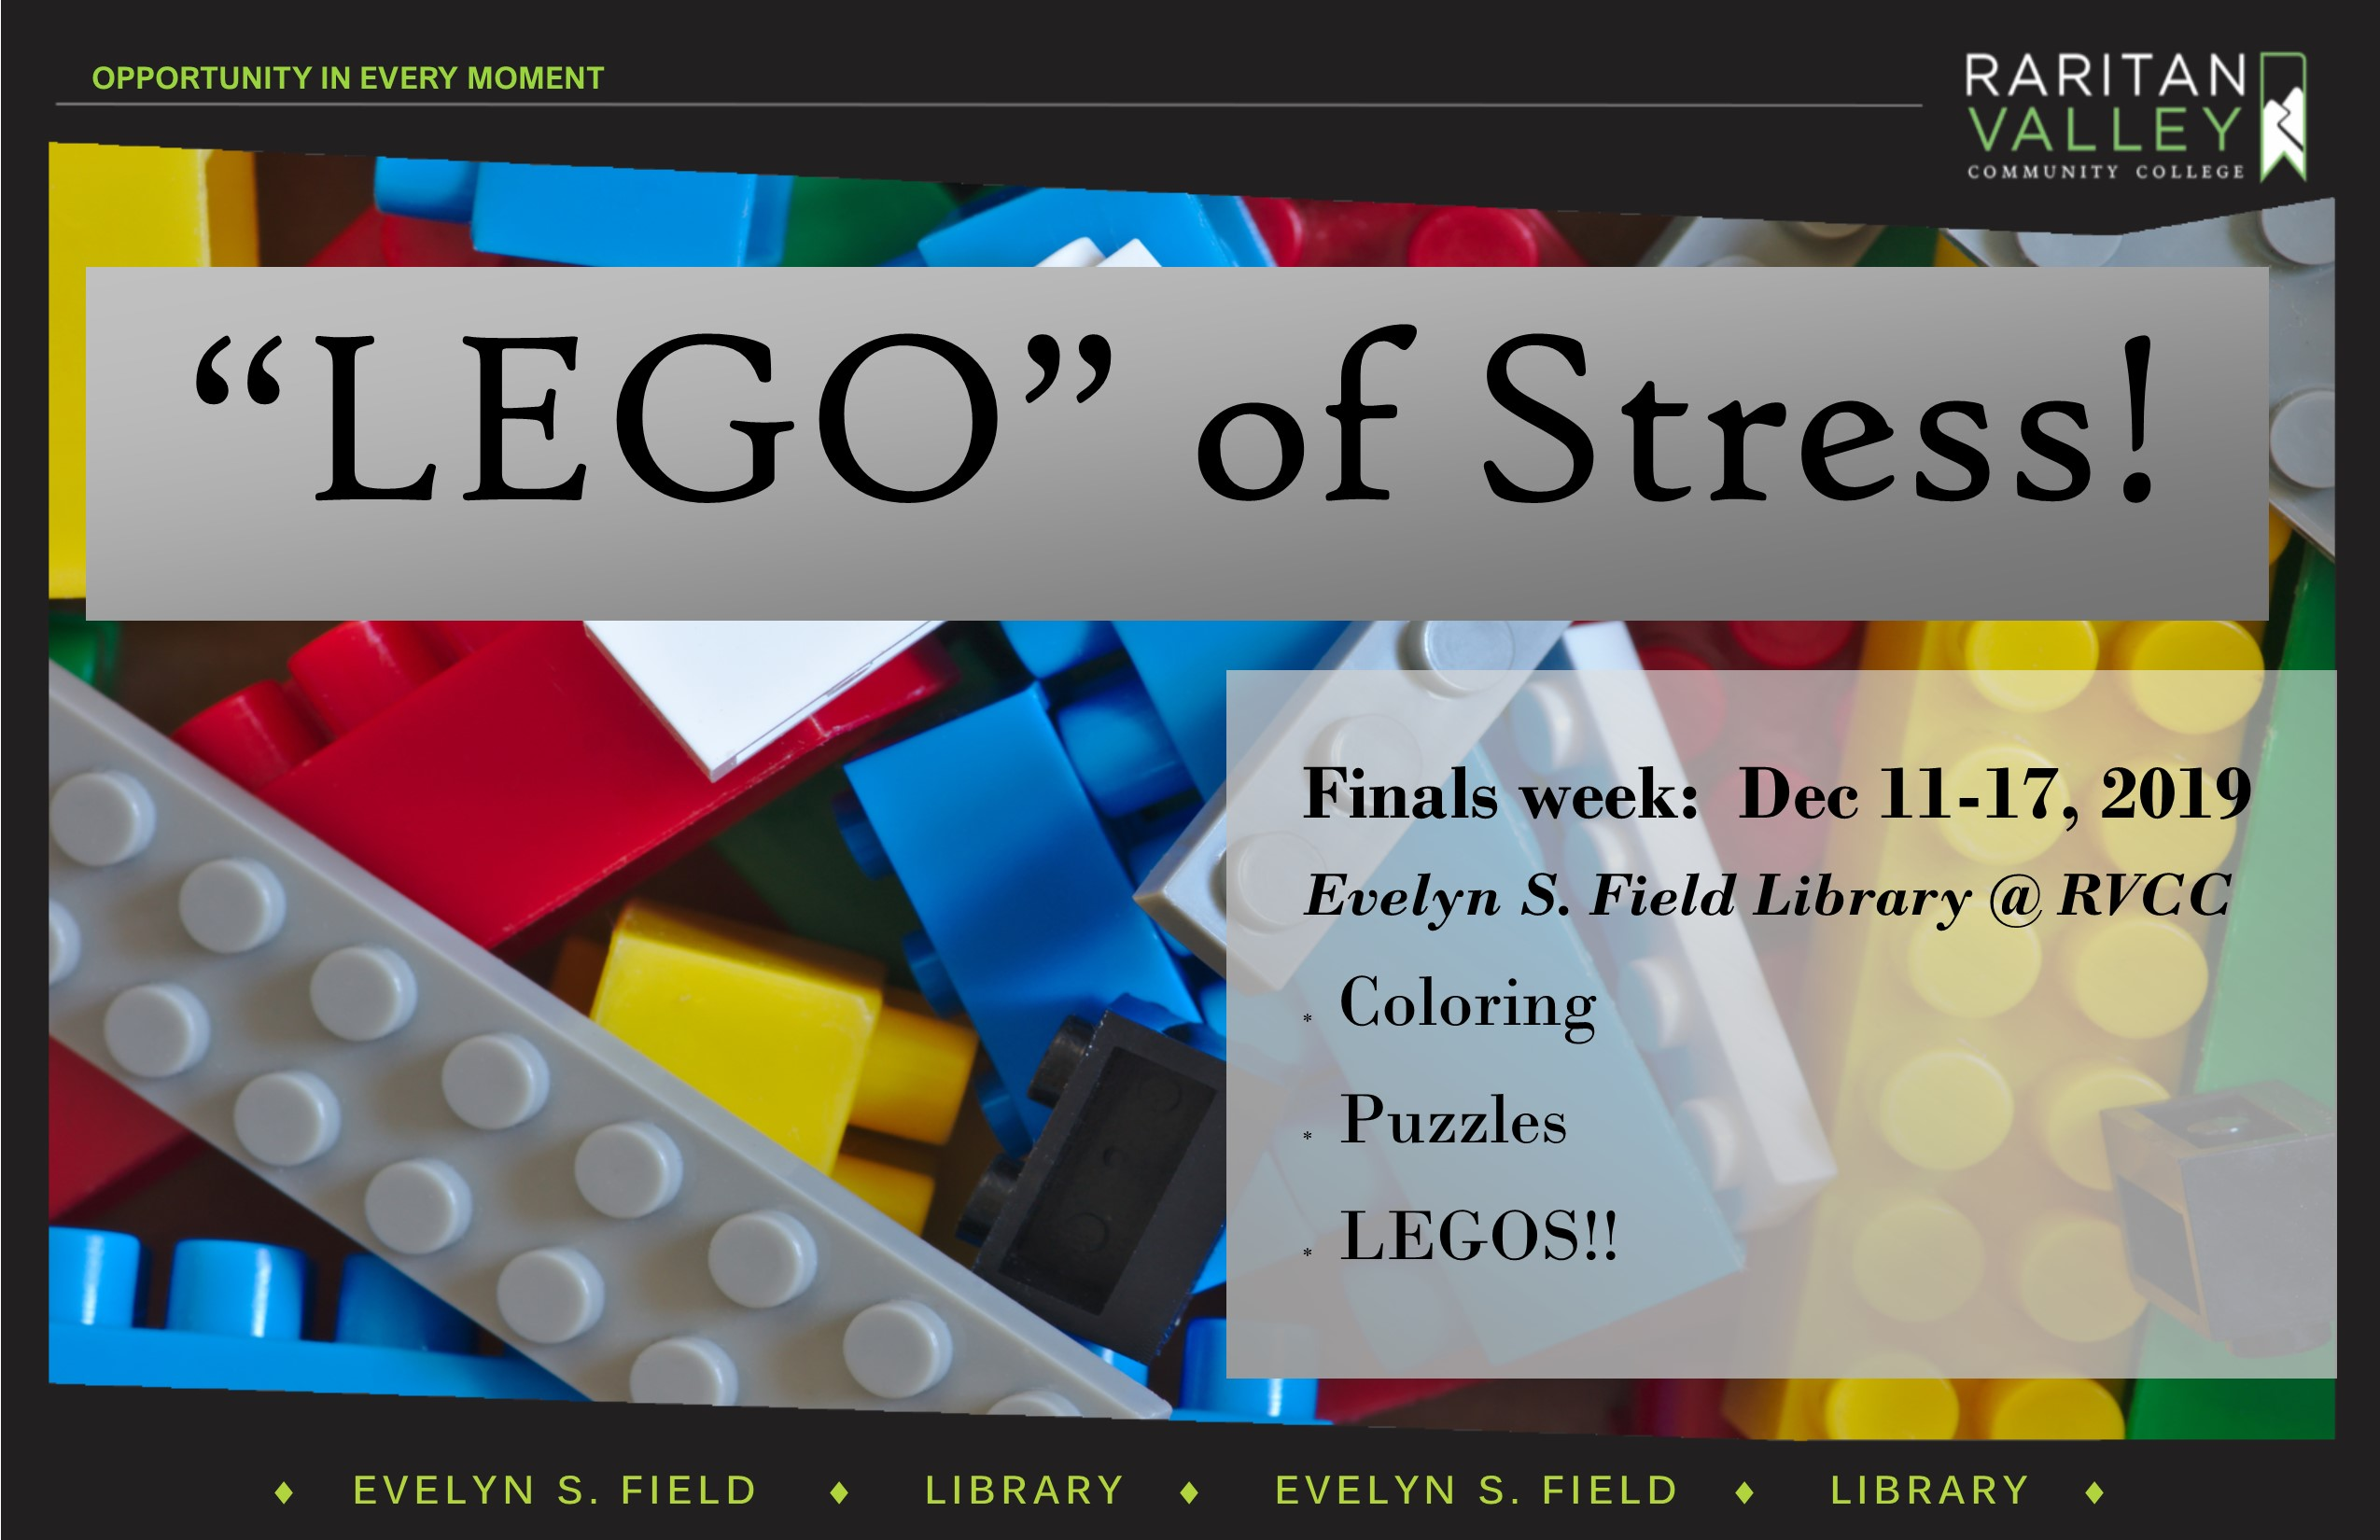 lego of stress